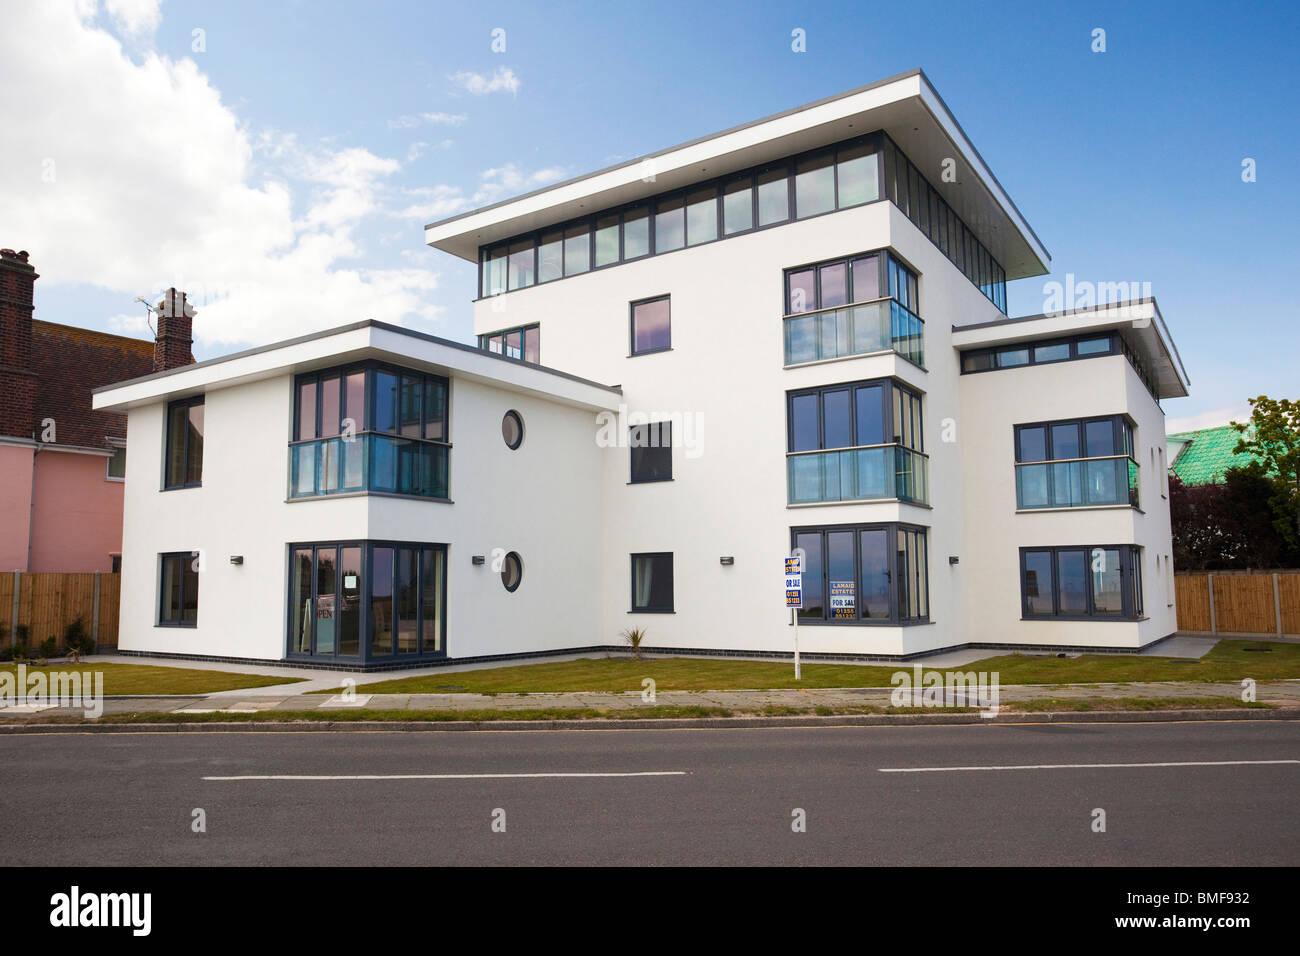 Modern Art Deco Style House At Frinton On Sea Essex UK